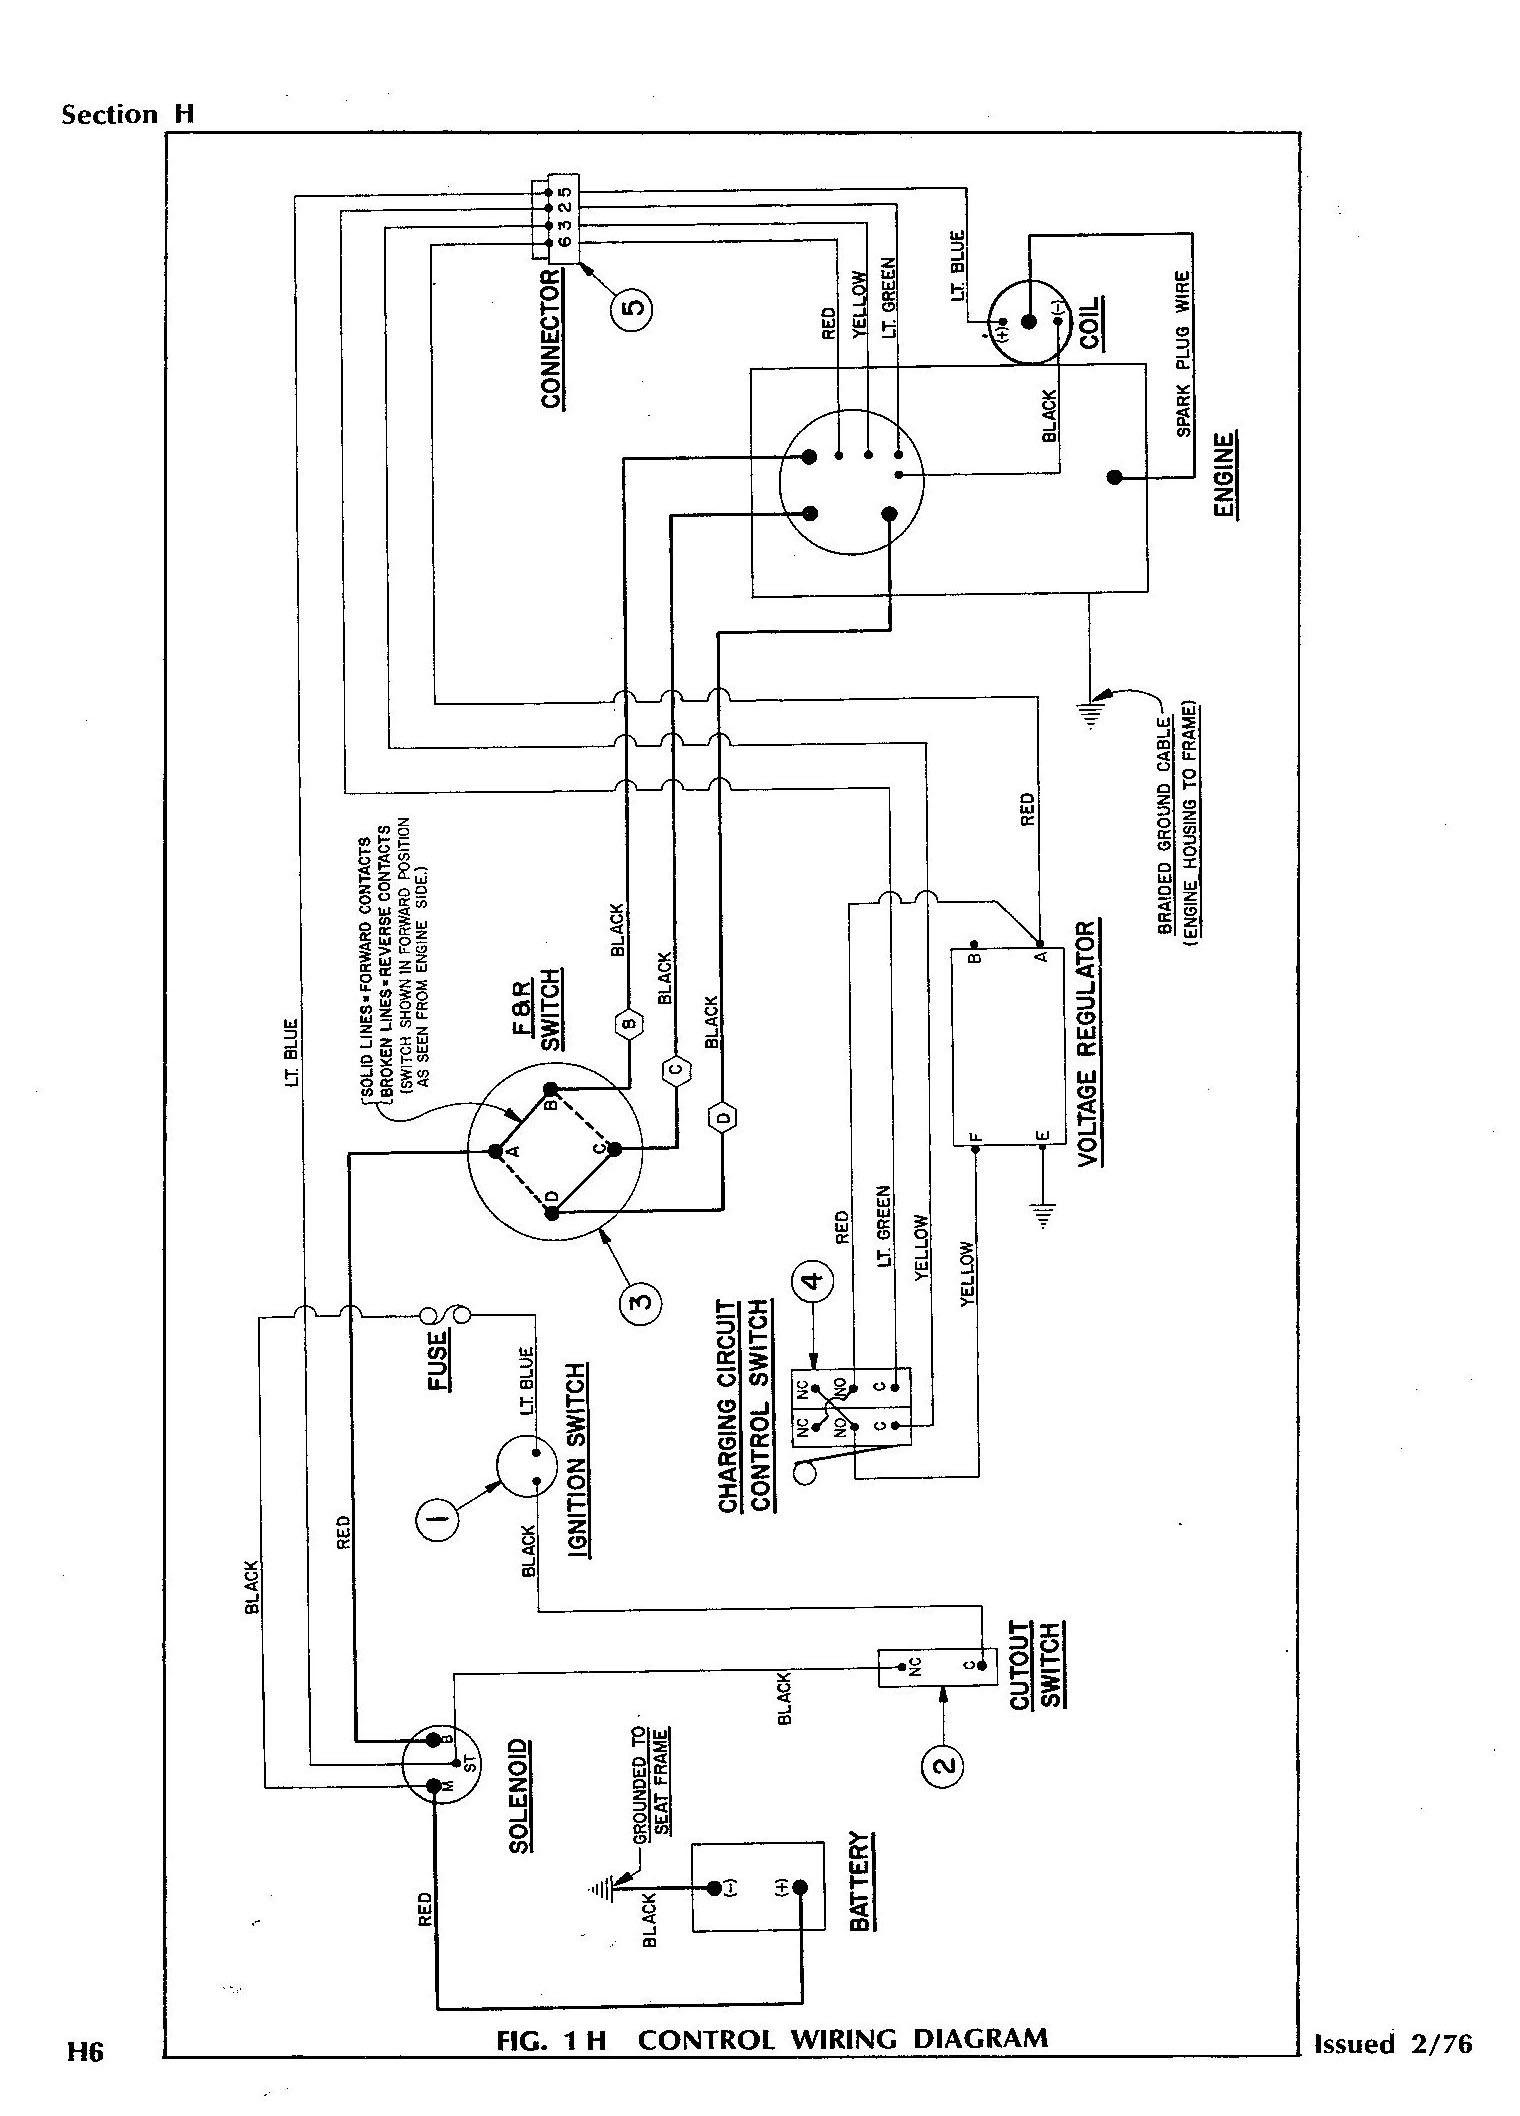 hight resolution of kart steering diagram on harley davidson golf cart gas engine harley davidson golf cart engine diagram